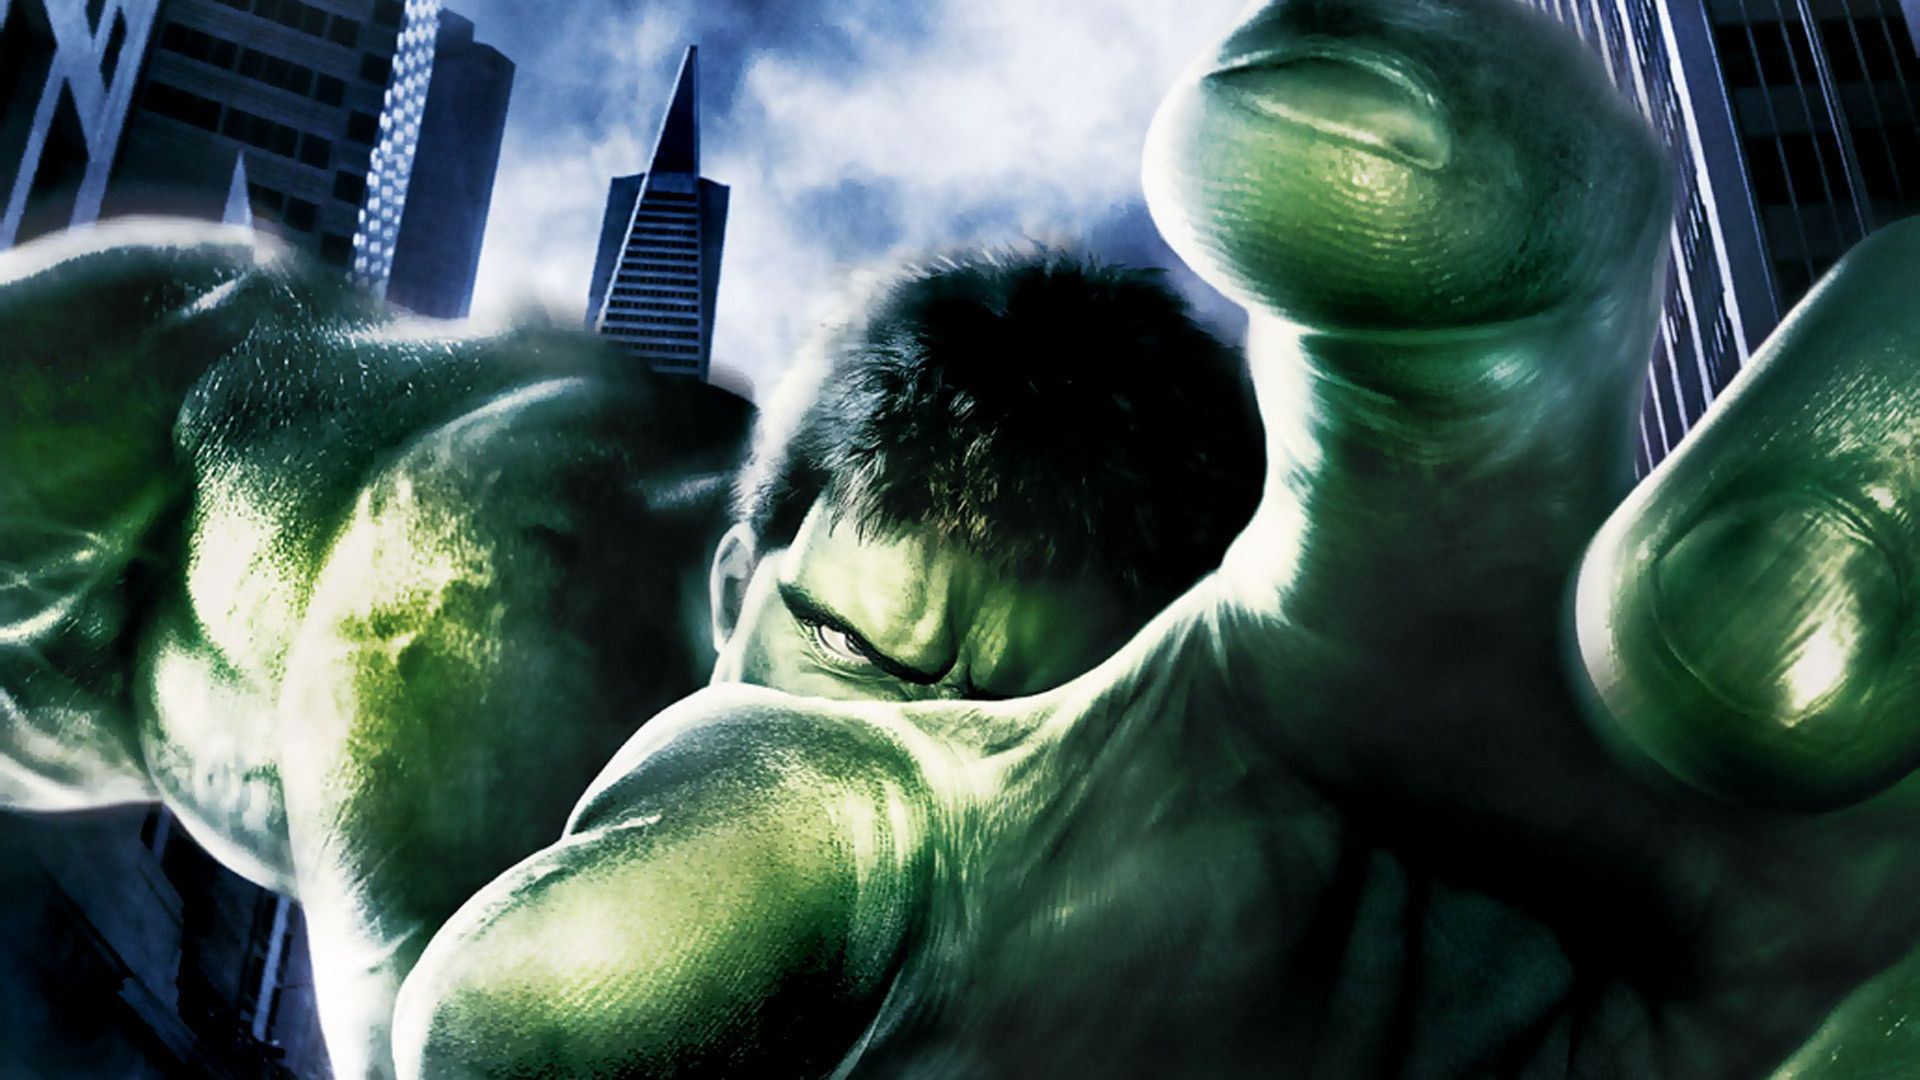 1920x1080 Hulk Movie Wallpapers Hulk Movie Wallpapers Hd Wallpapers Hulk Movie Hulk Marvel Avengers Movies